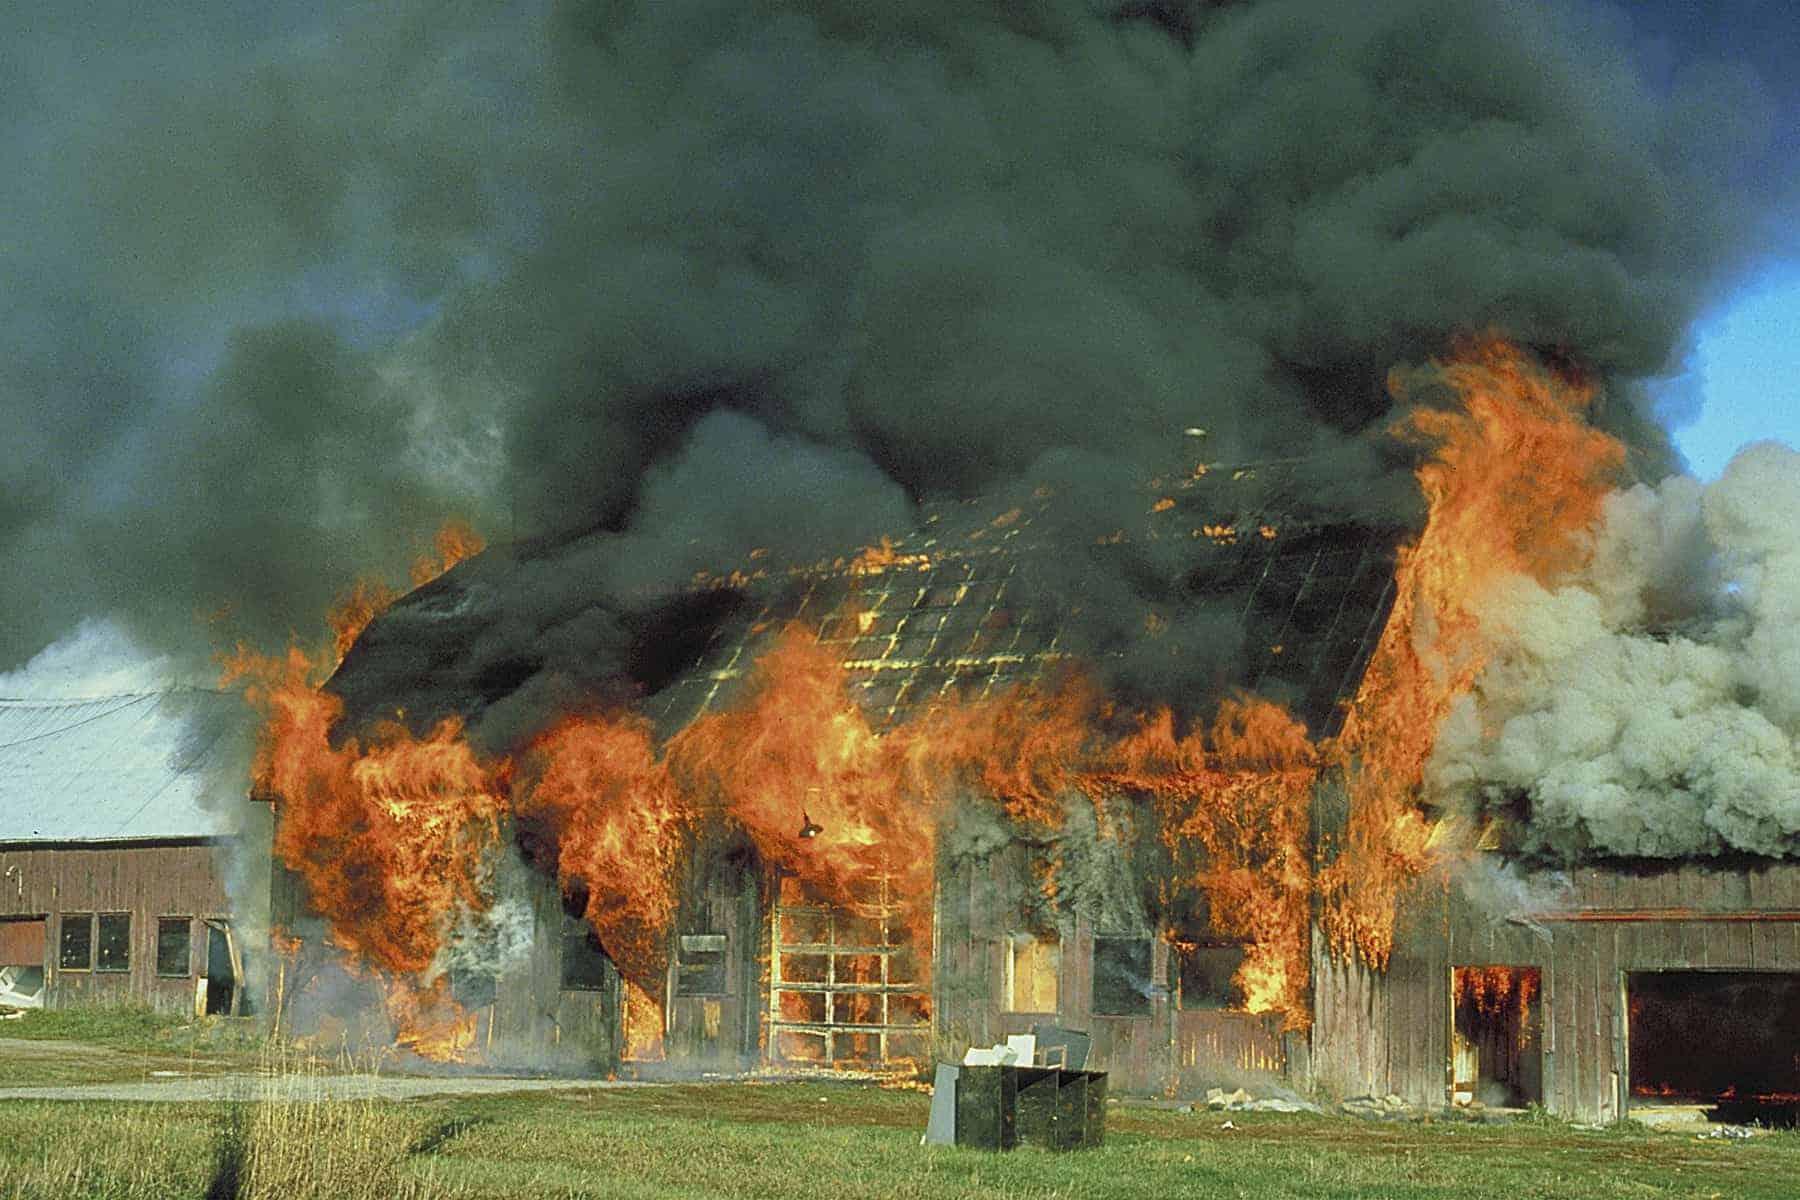 Barn Fire Prevention